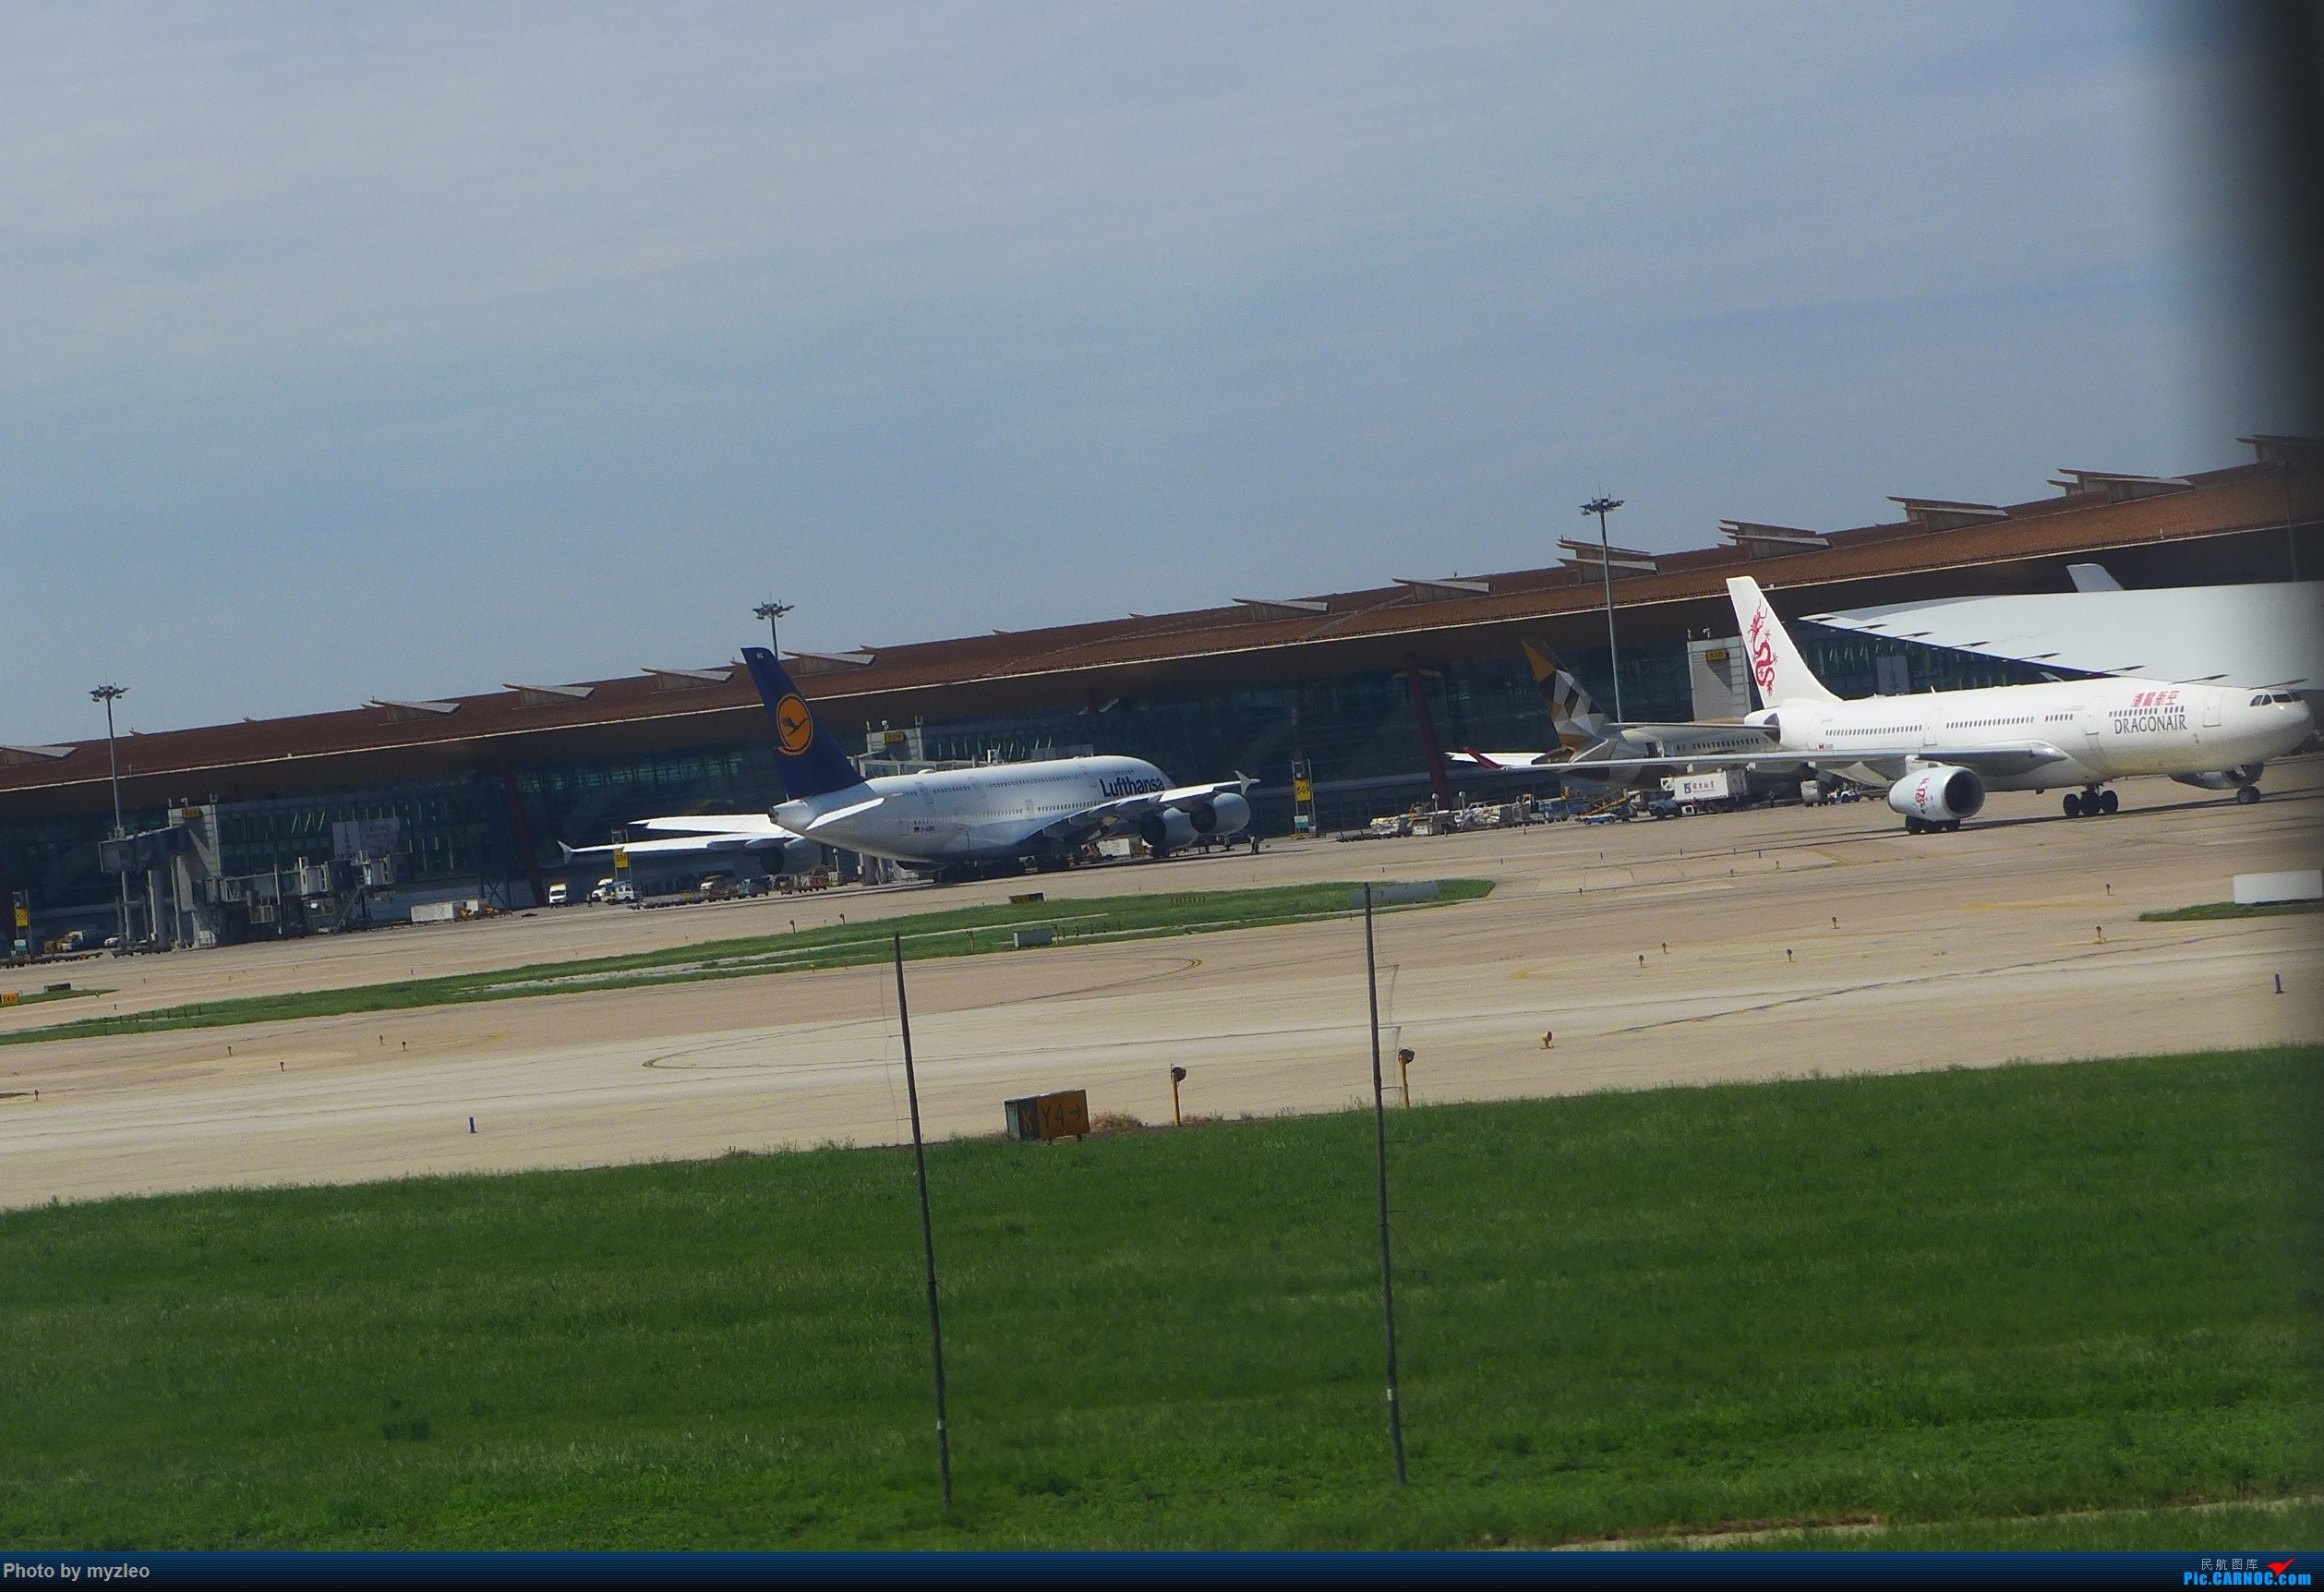 Re:[原创]【myzleo的游记3.1】三访帝都——记一次意外的惊喜,大鹅头初遇,第一次去中关村 AIRBUS A380-800  中国北京首都国际机场